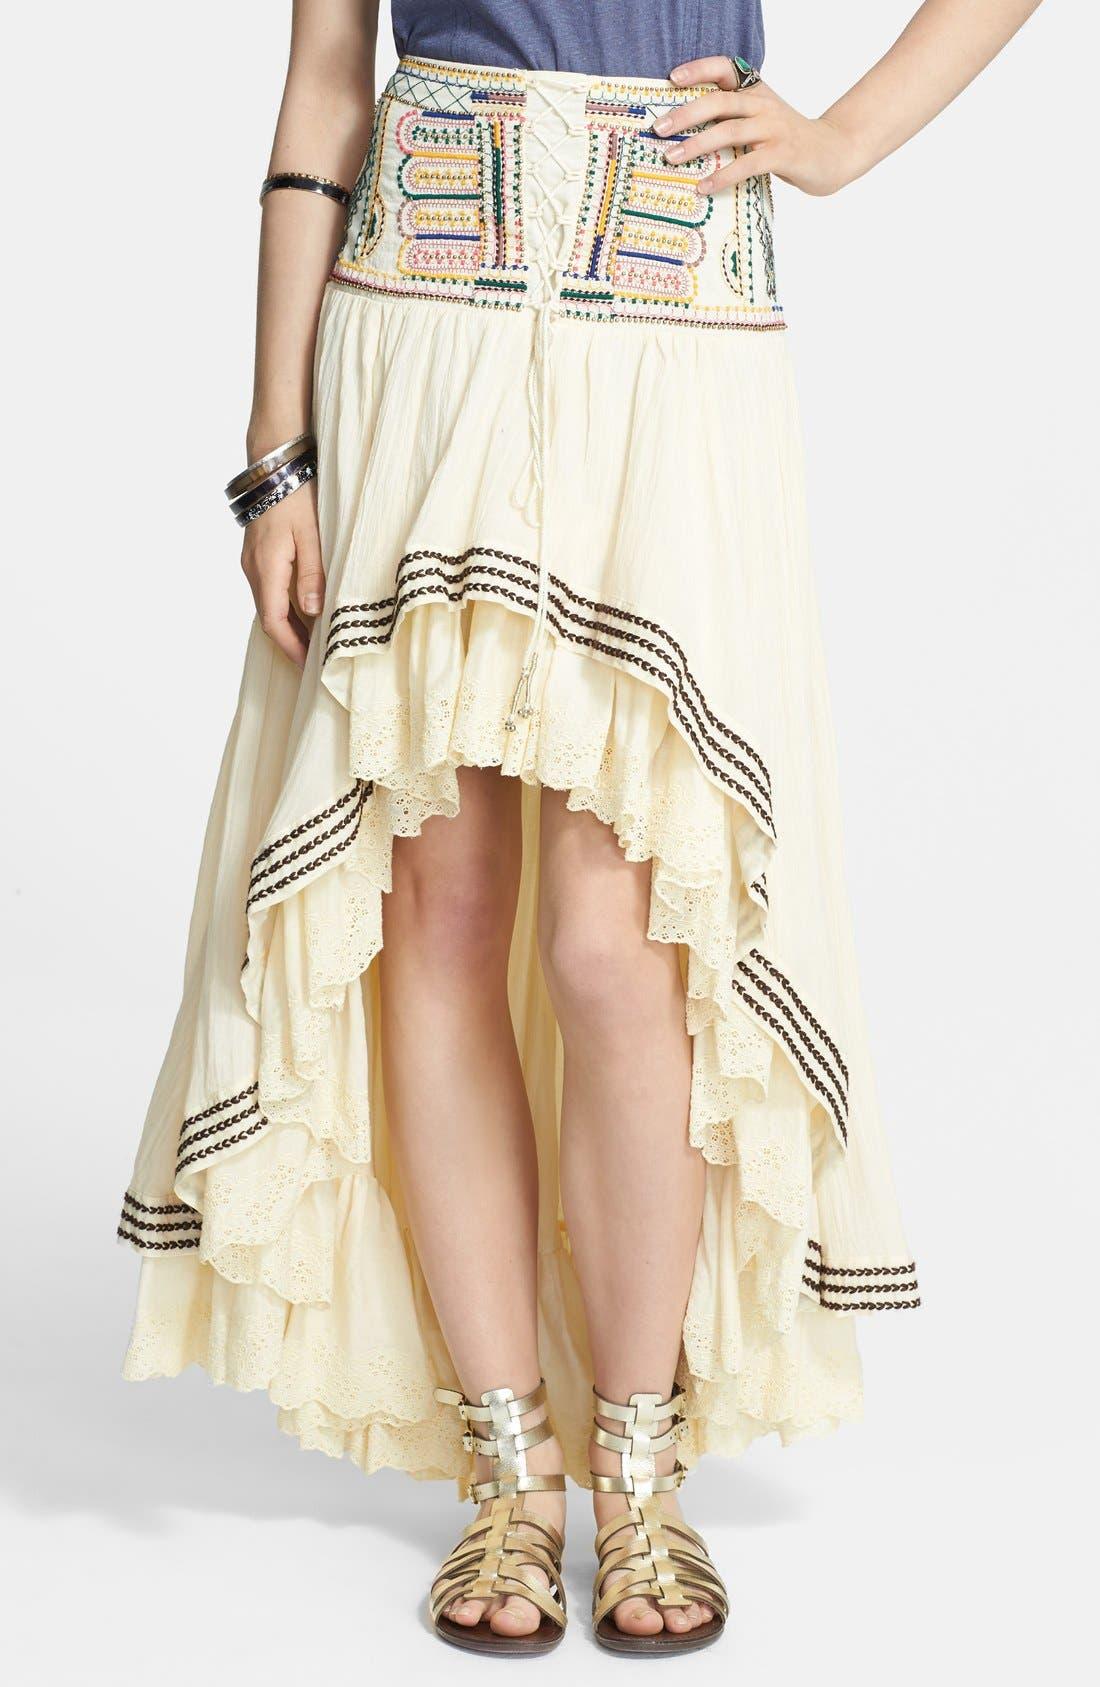 Alternate Image 1 Selected - Free People 'Prairie Dreams' Cotton Blend High/Low Skirt